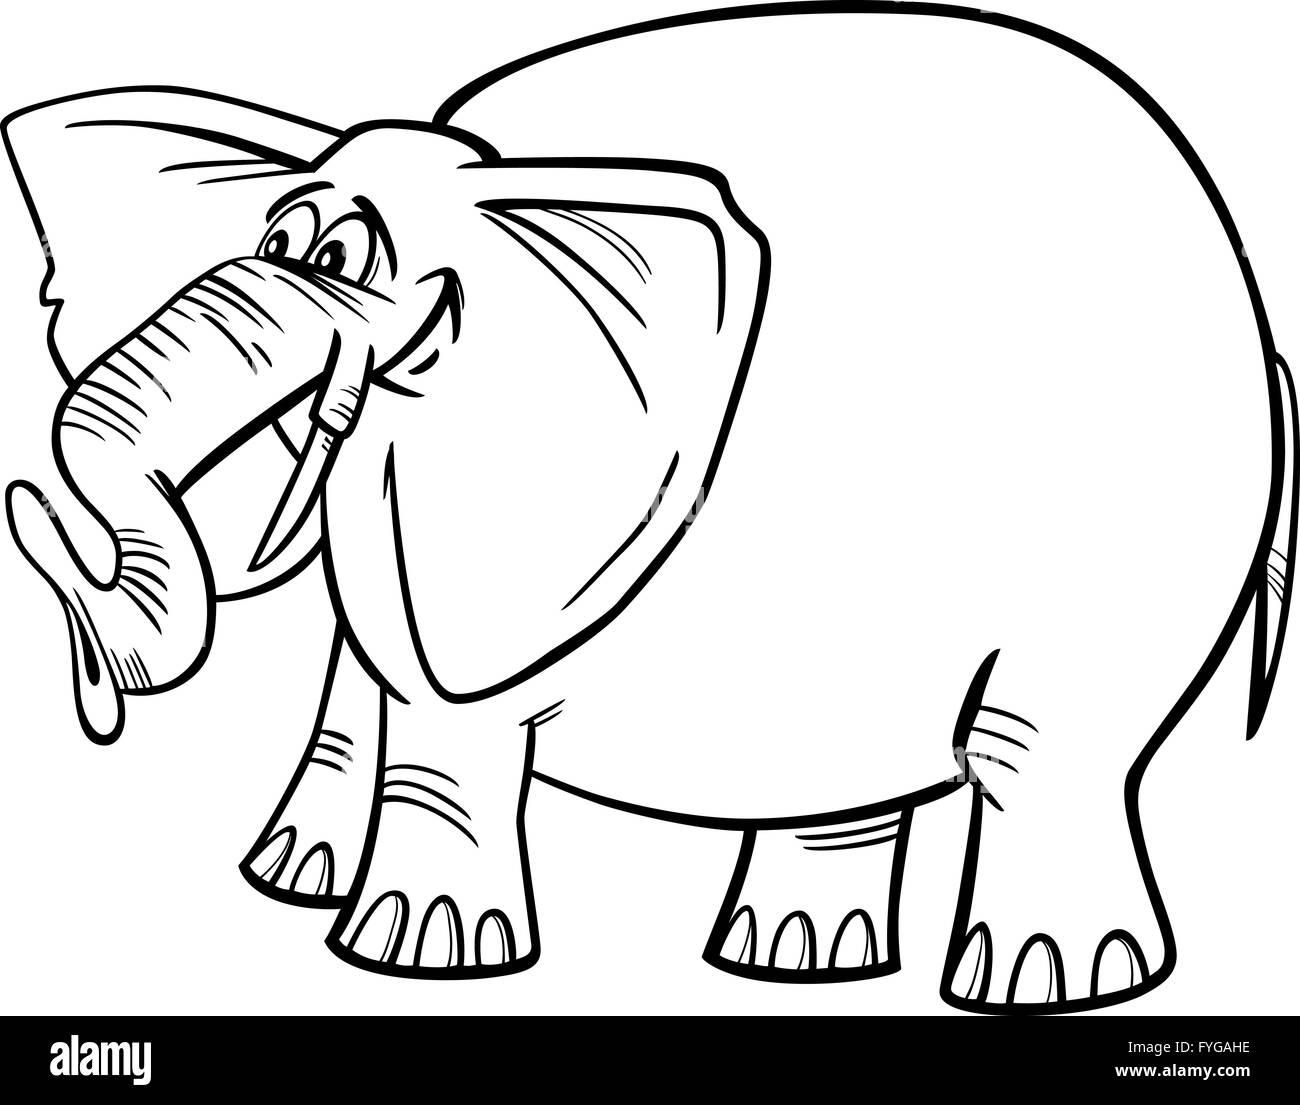 elefanten comic illustration f r f rbung stockfoto bild 103007114 alamy. Black Bedroom Furniture Sets. Home Design Ideas